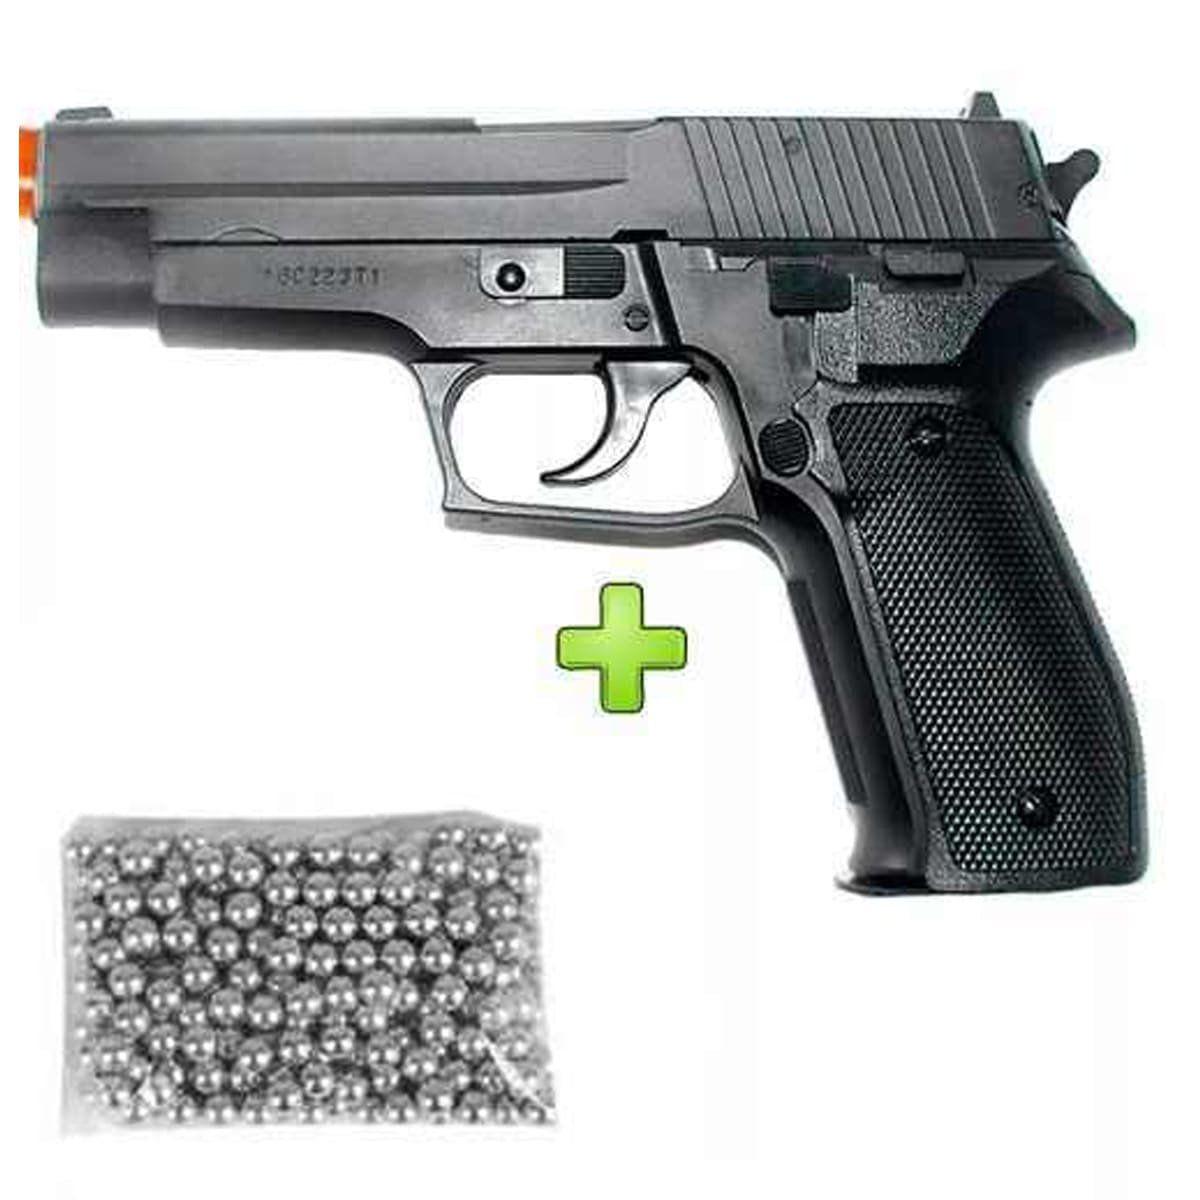 Pistola Pressão Sig Sauer P226 4,5 Metal Mostruário+ Esferas